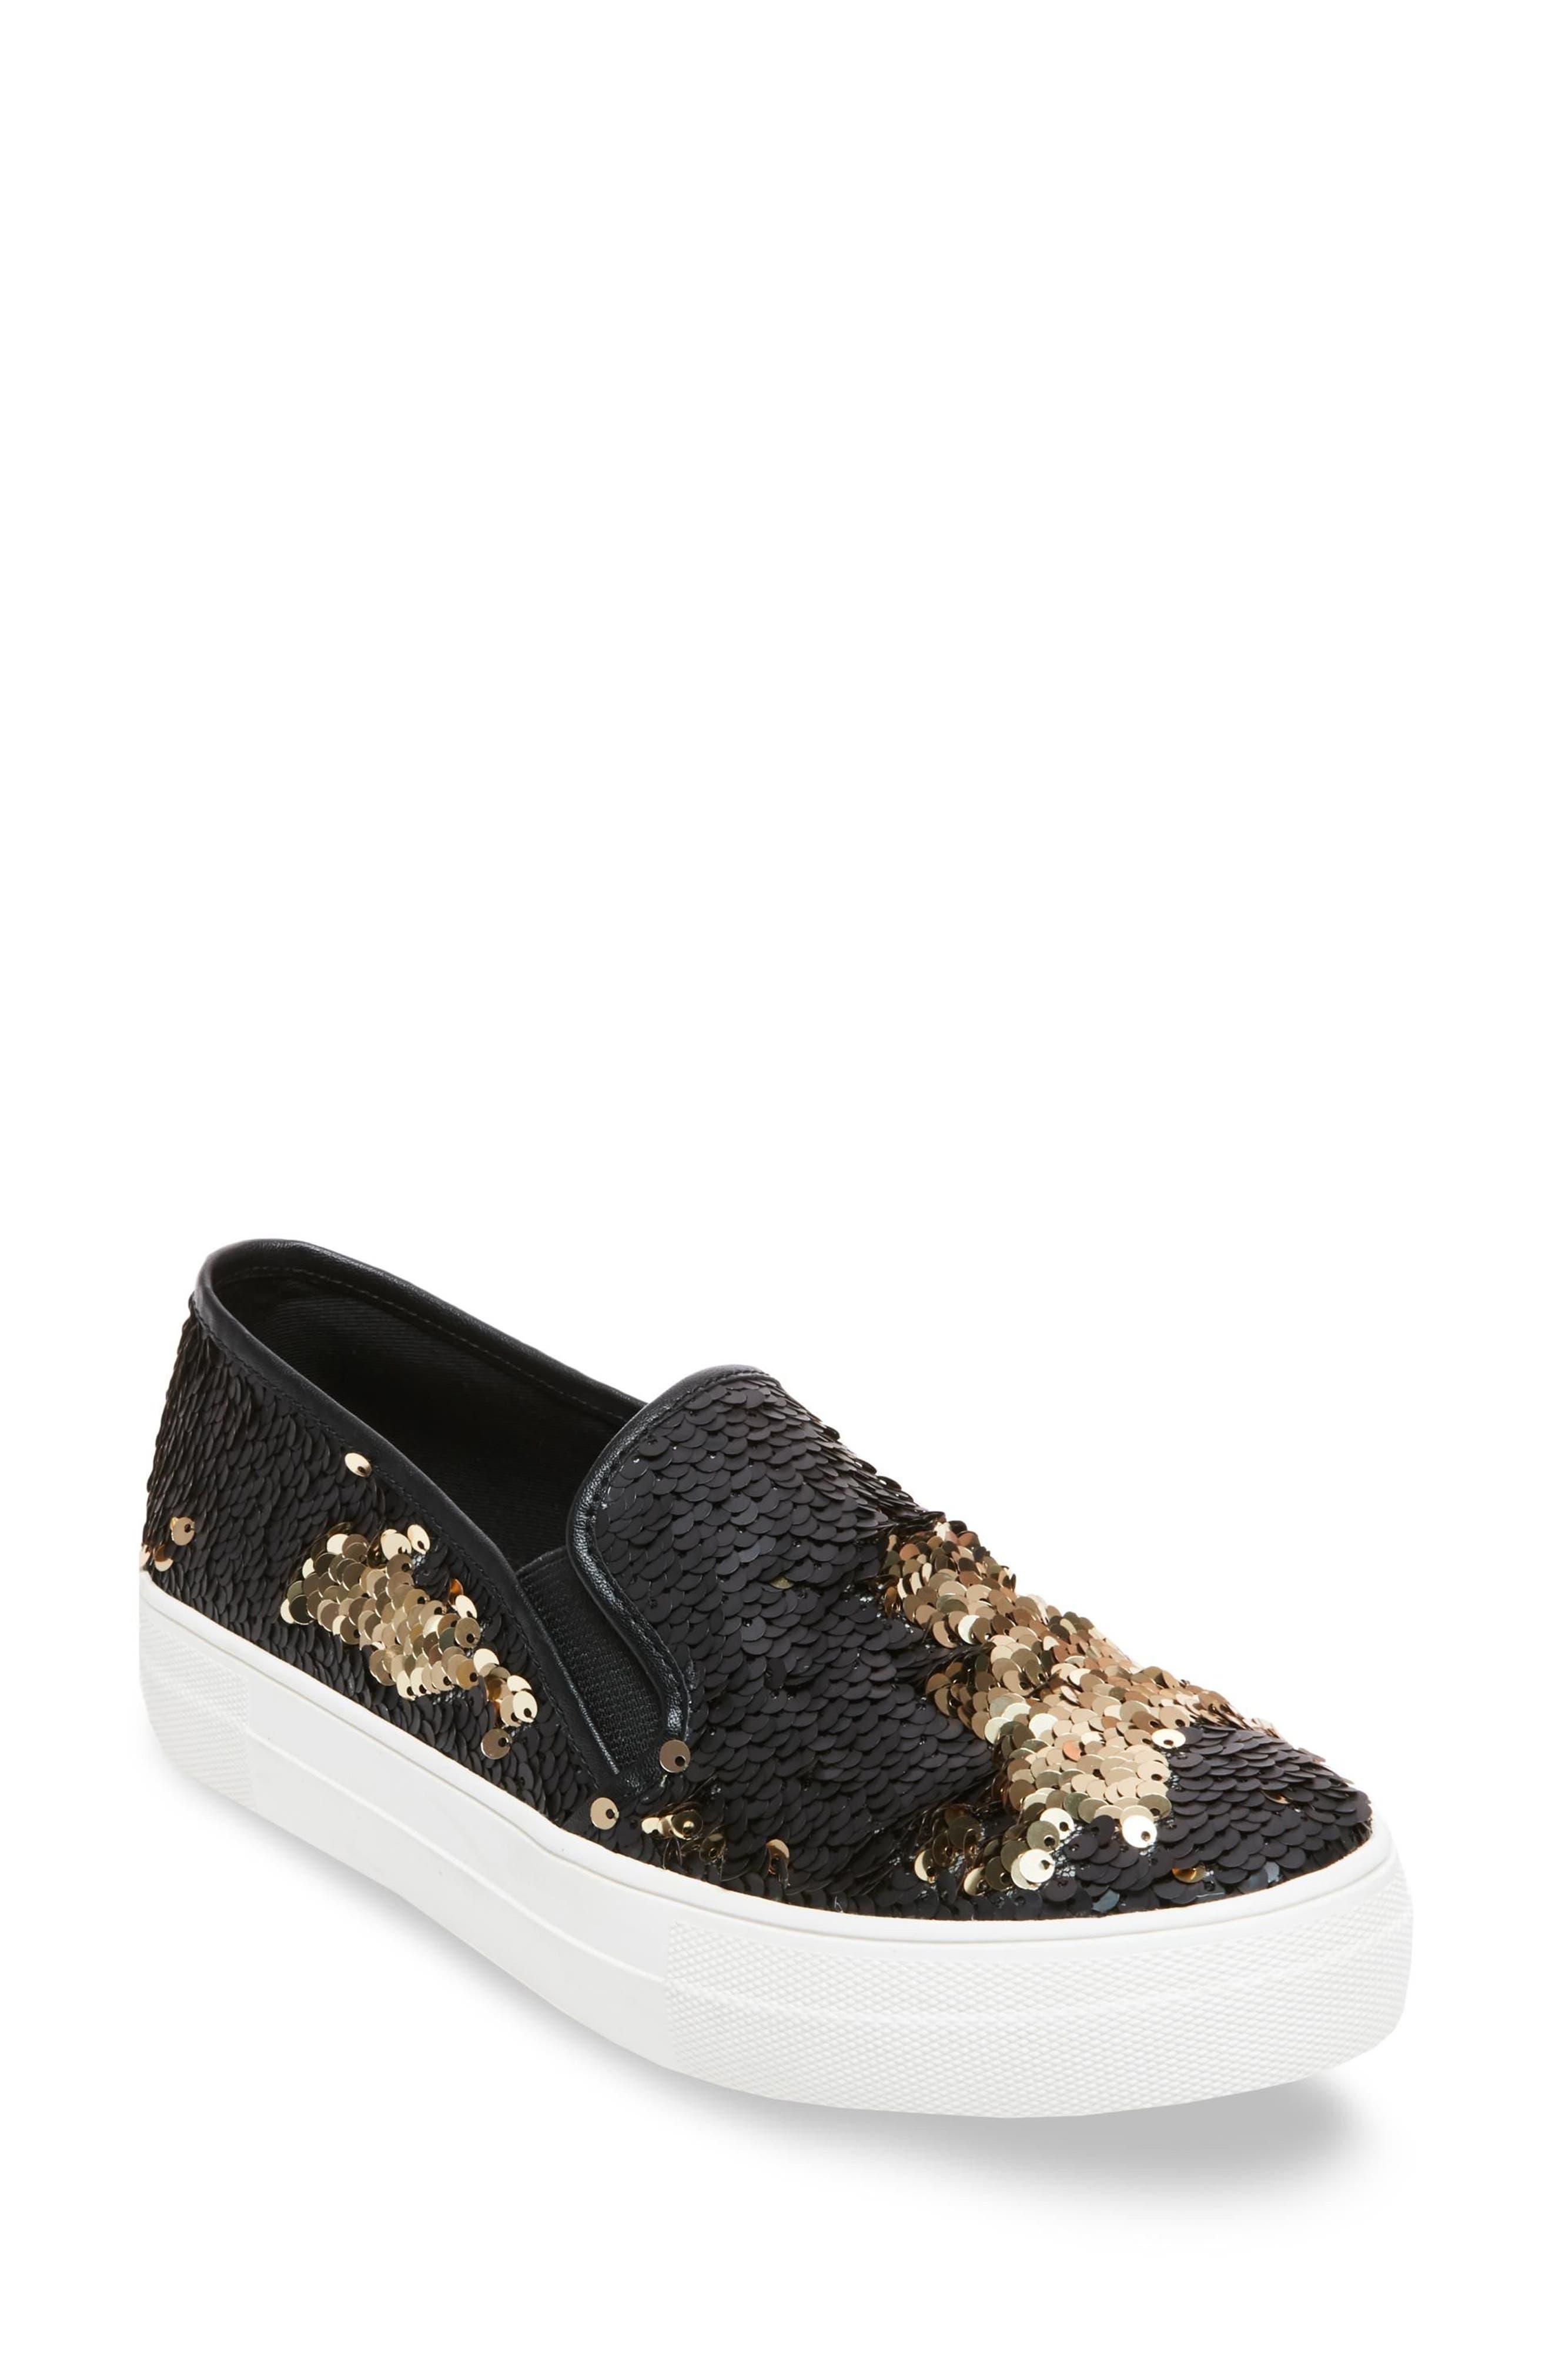 Gills Sequined Slip-On Platform Sneaker,                             Main thumbnail 1, color,